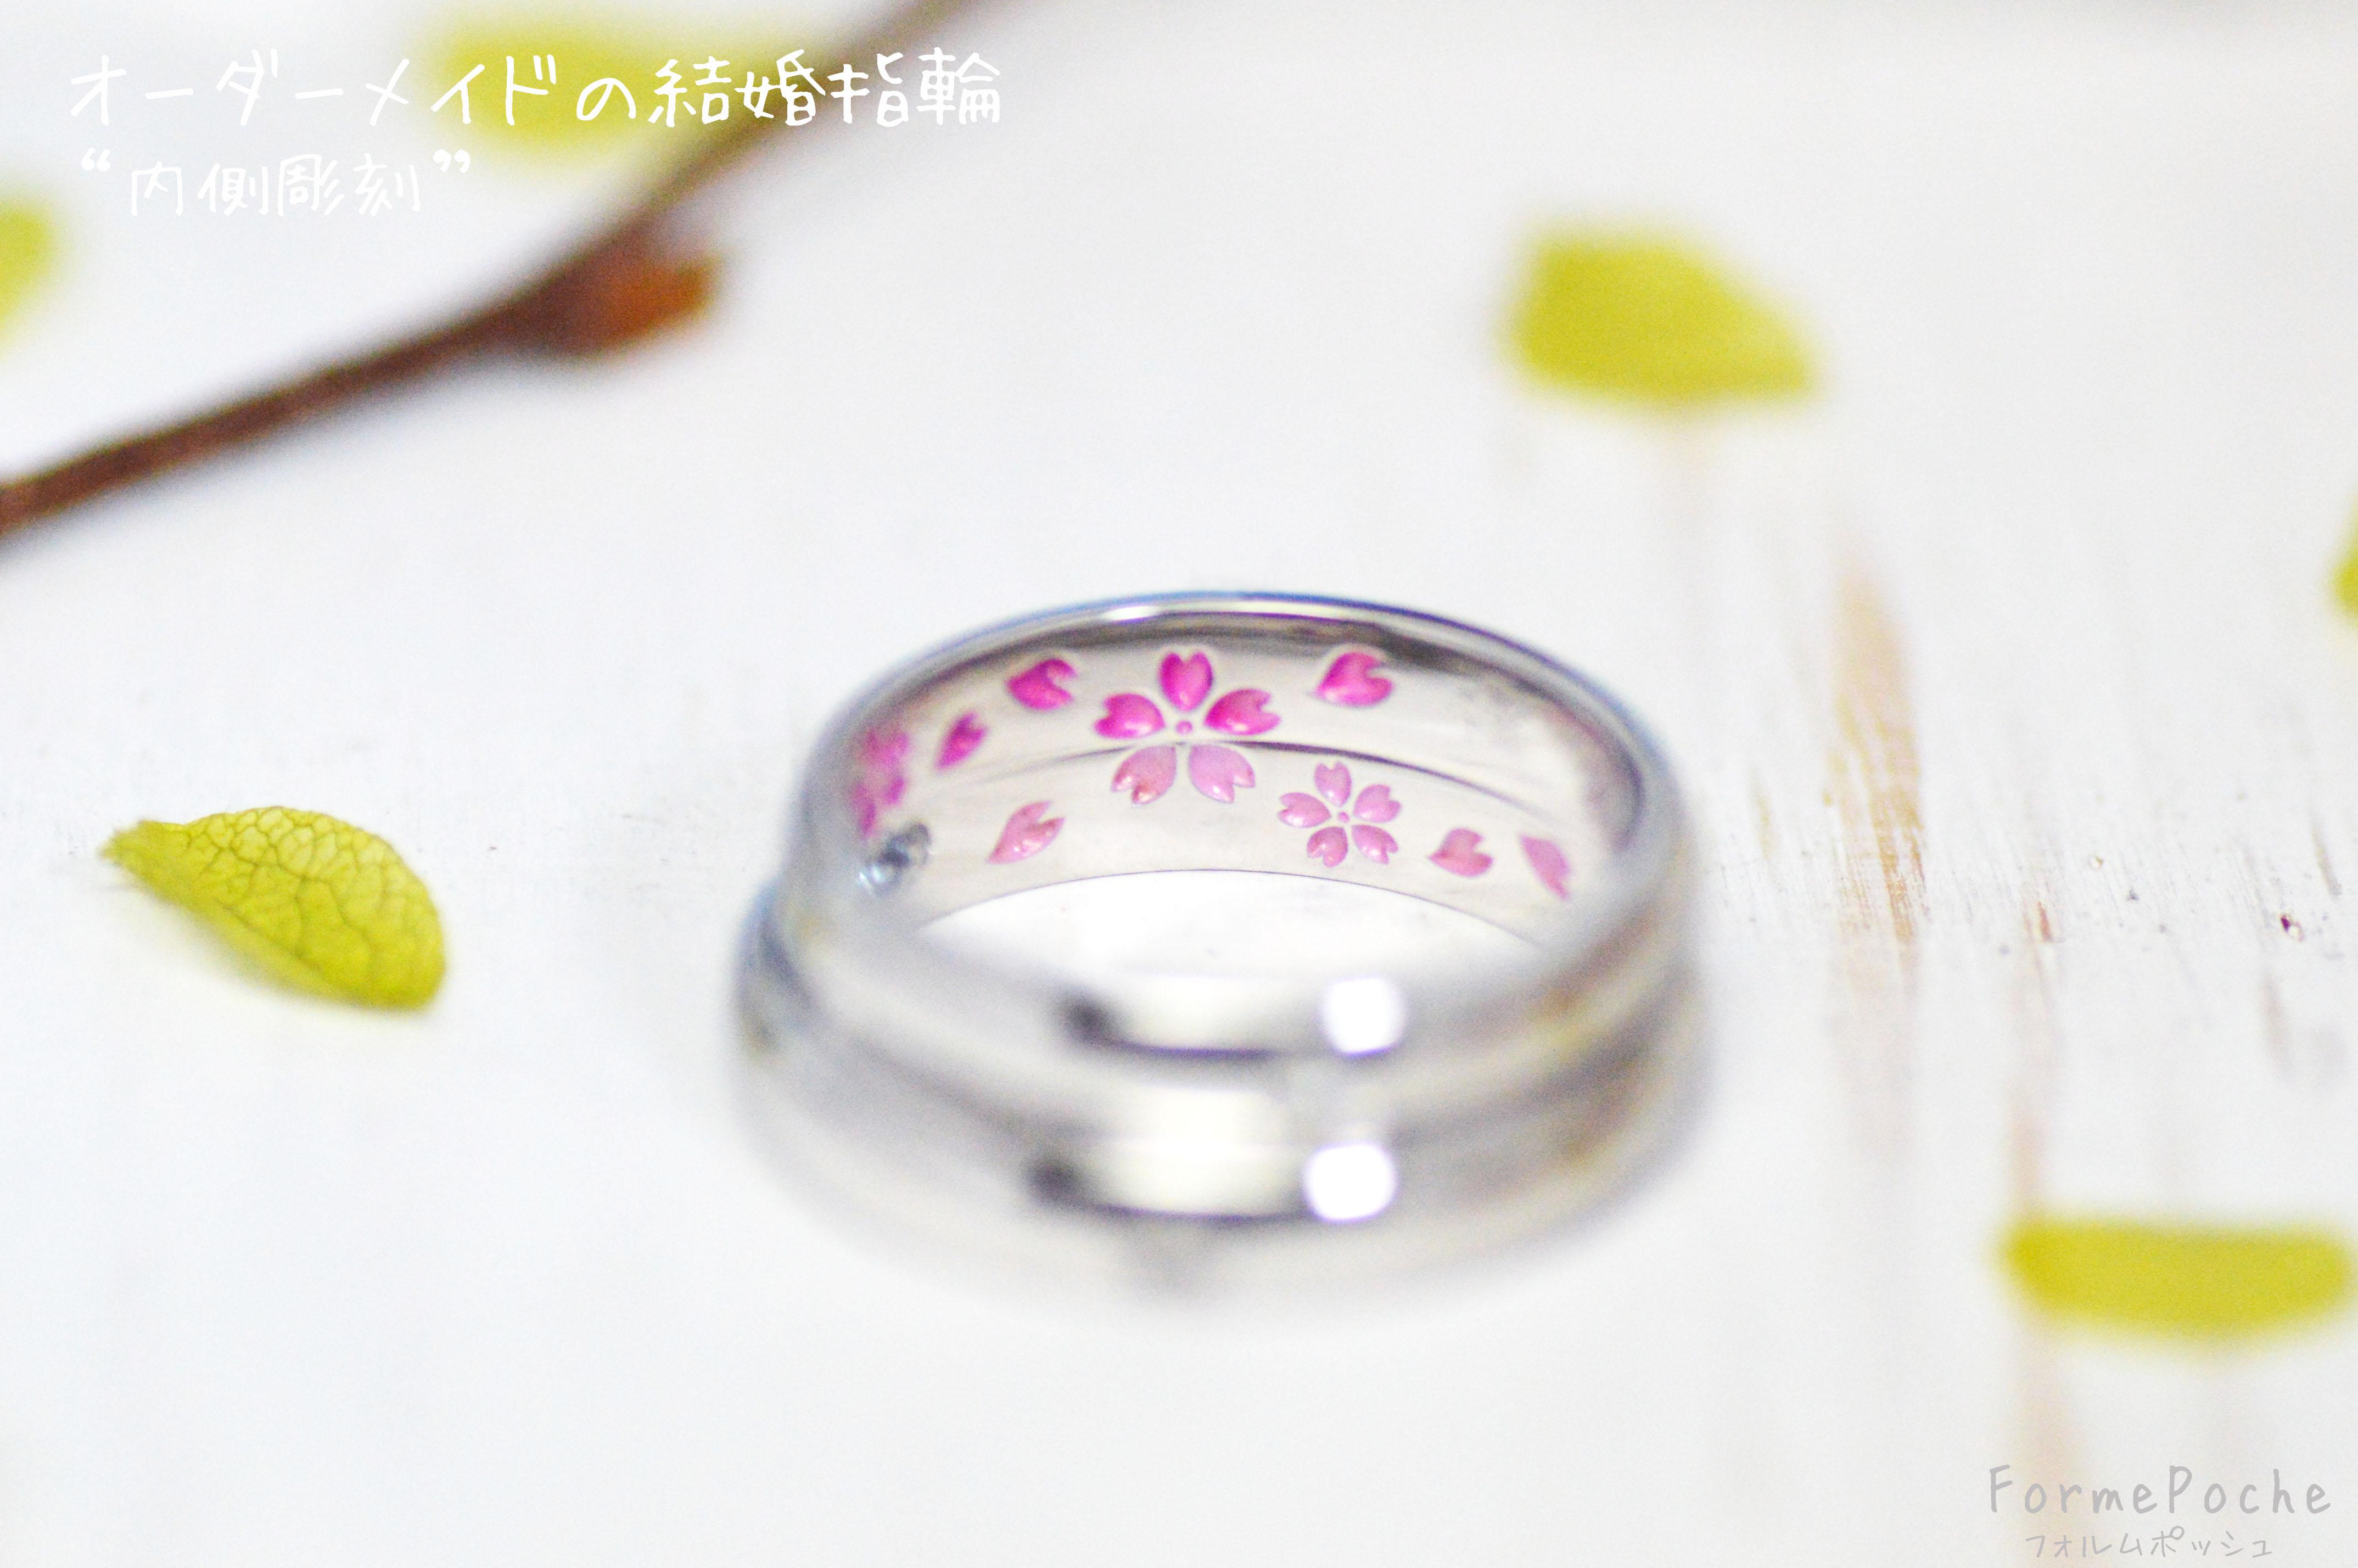 hi180528w1156-ring3 オーダーメイドの結婚指輪 桜 ピンク 色つき